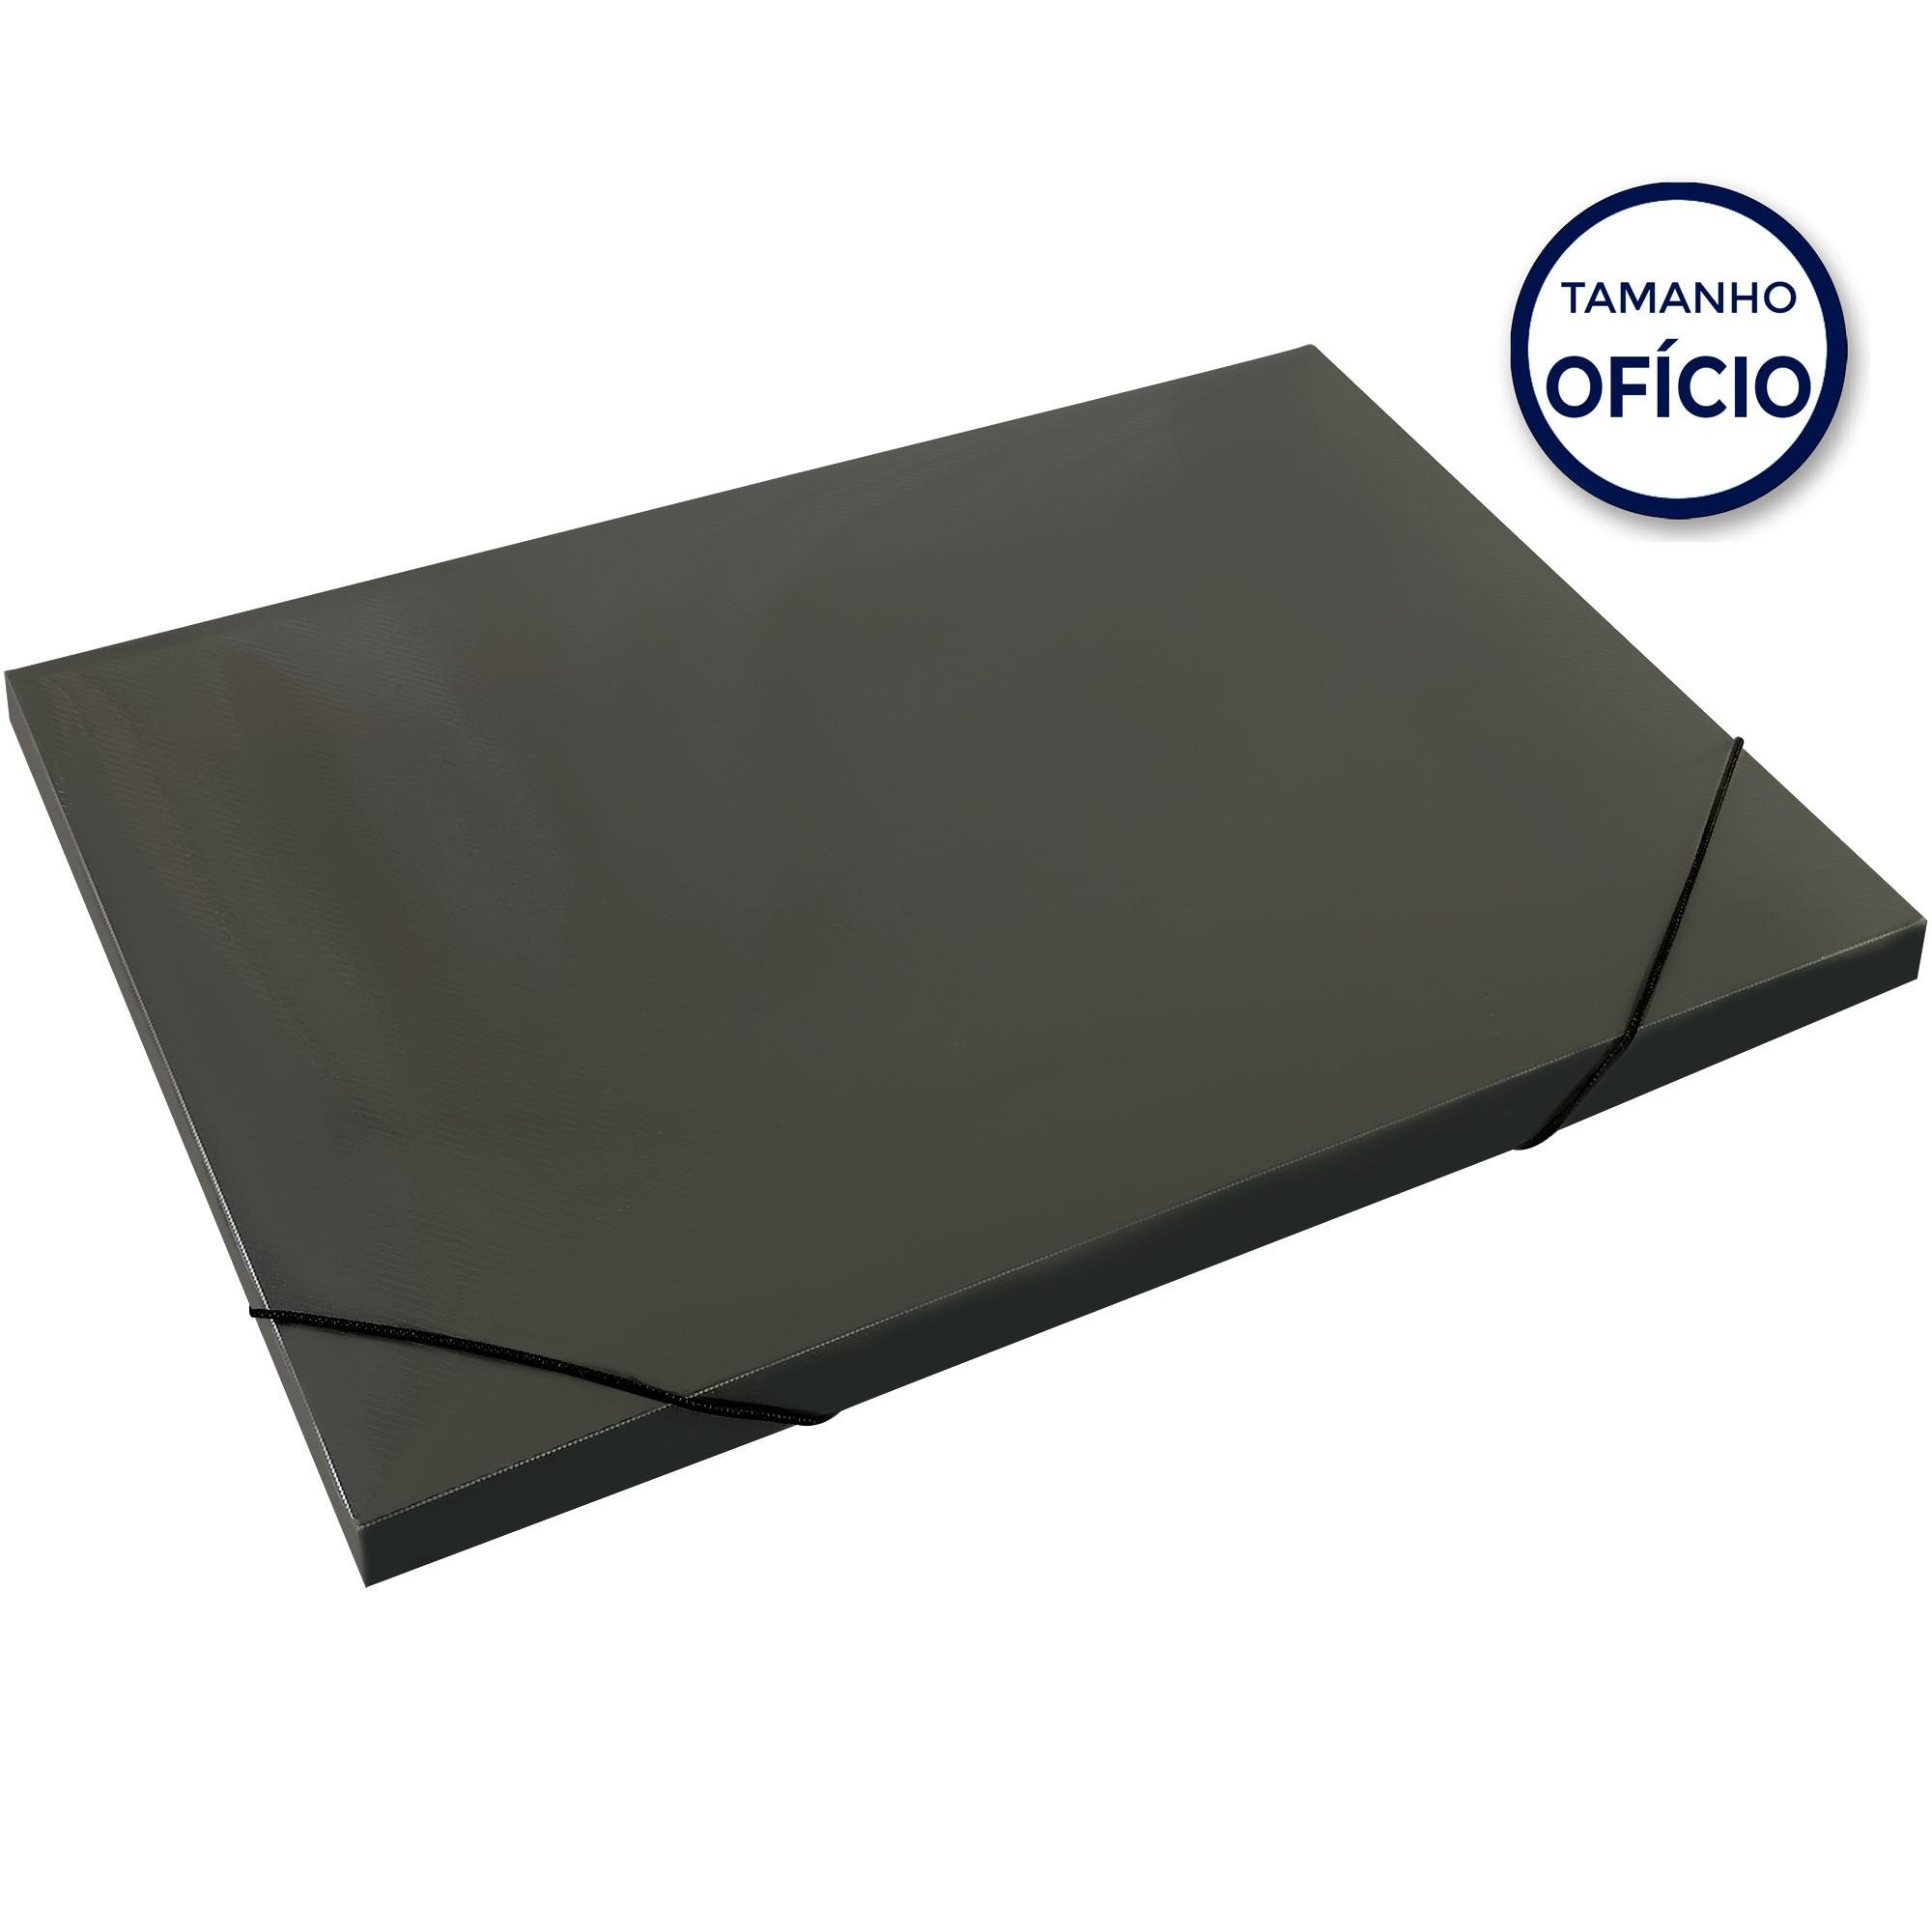 Pasta Aba Elastica Plastica Tam Oficio 18MM Cor Fume Soft 160316 - Polibras